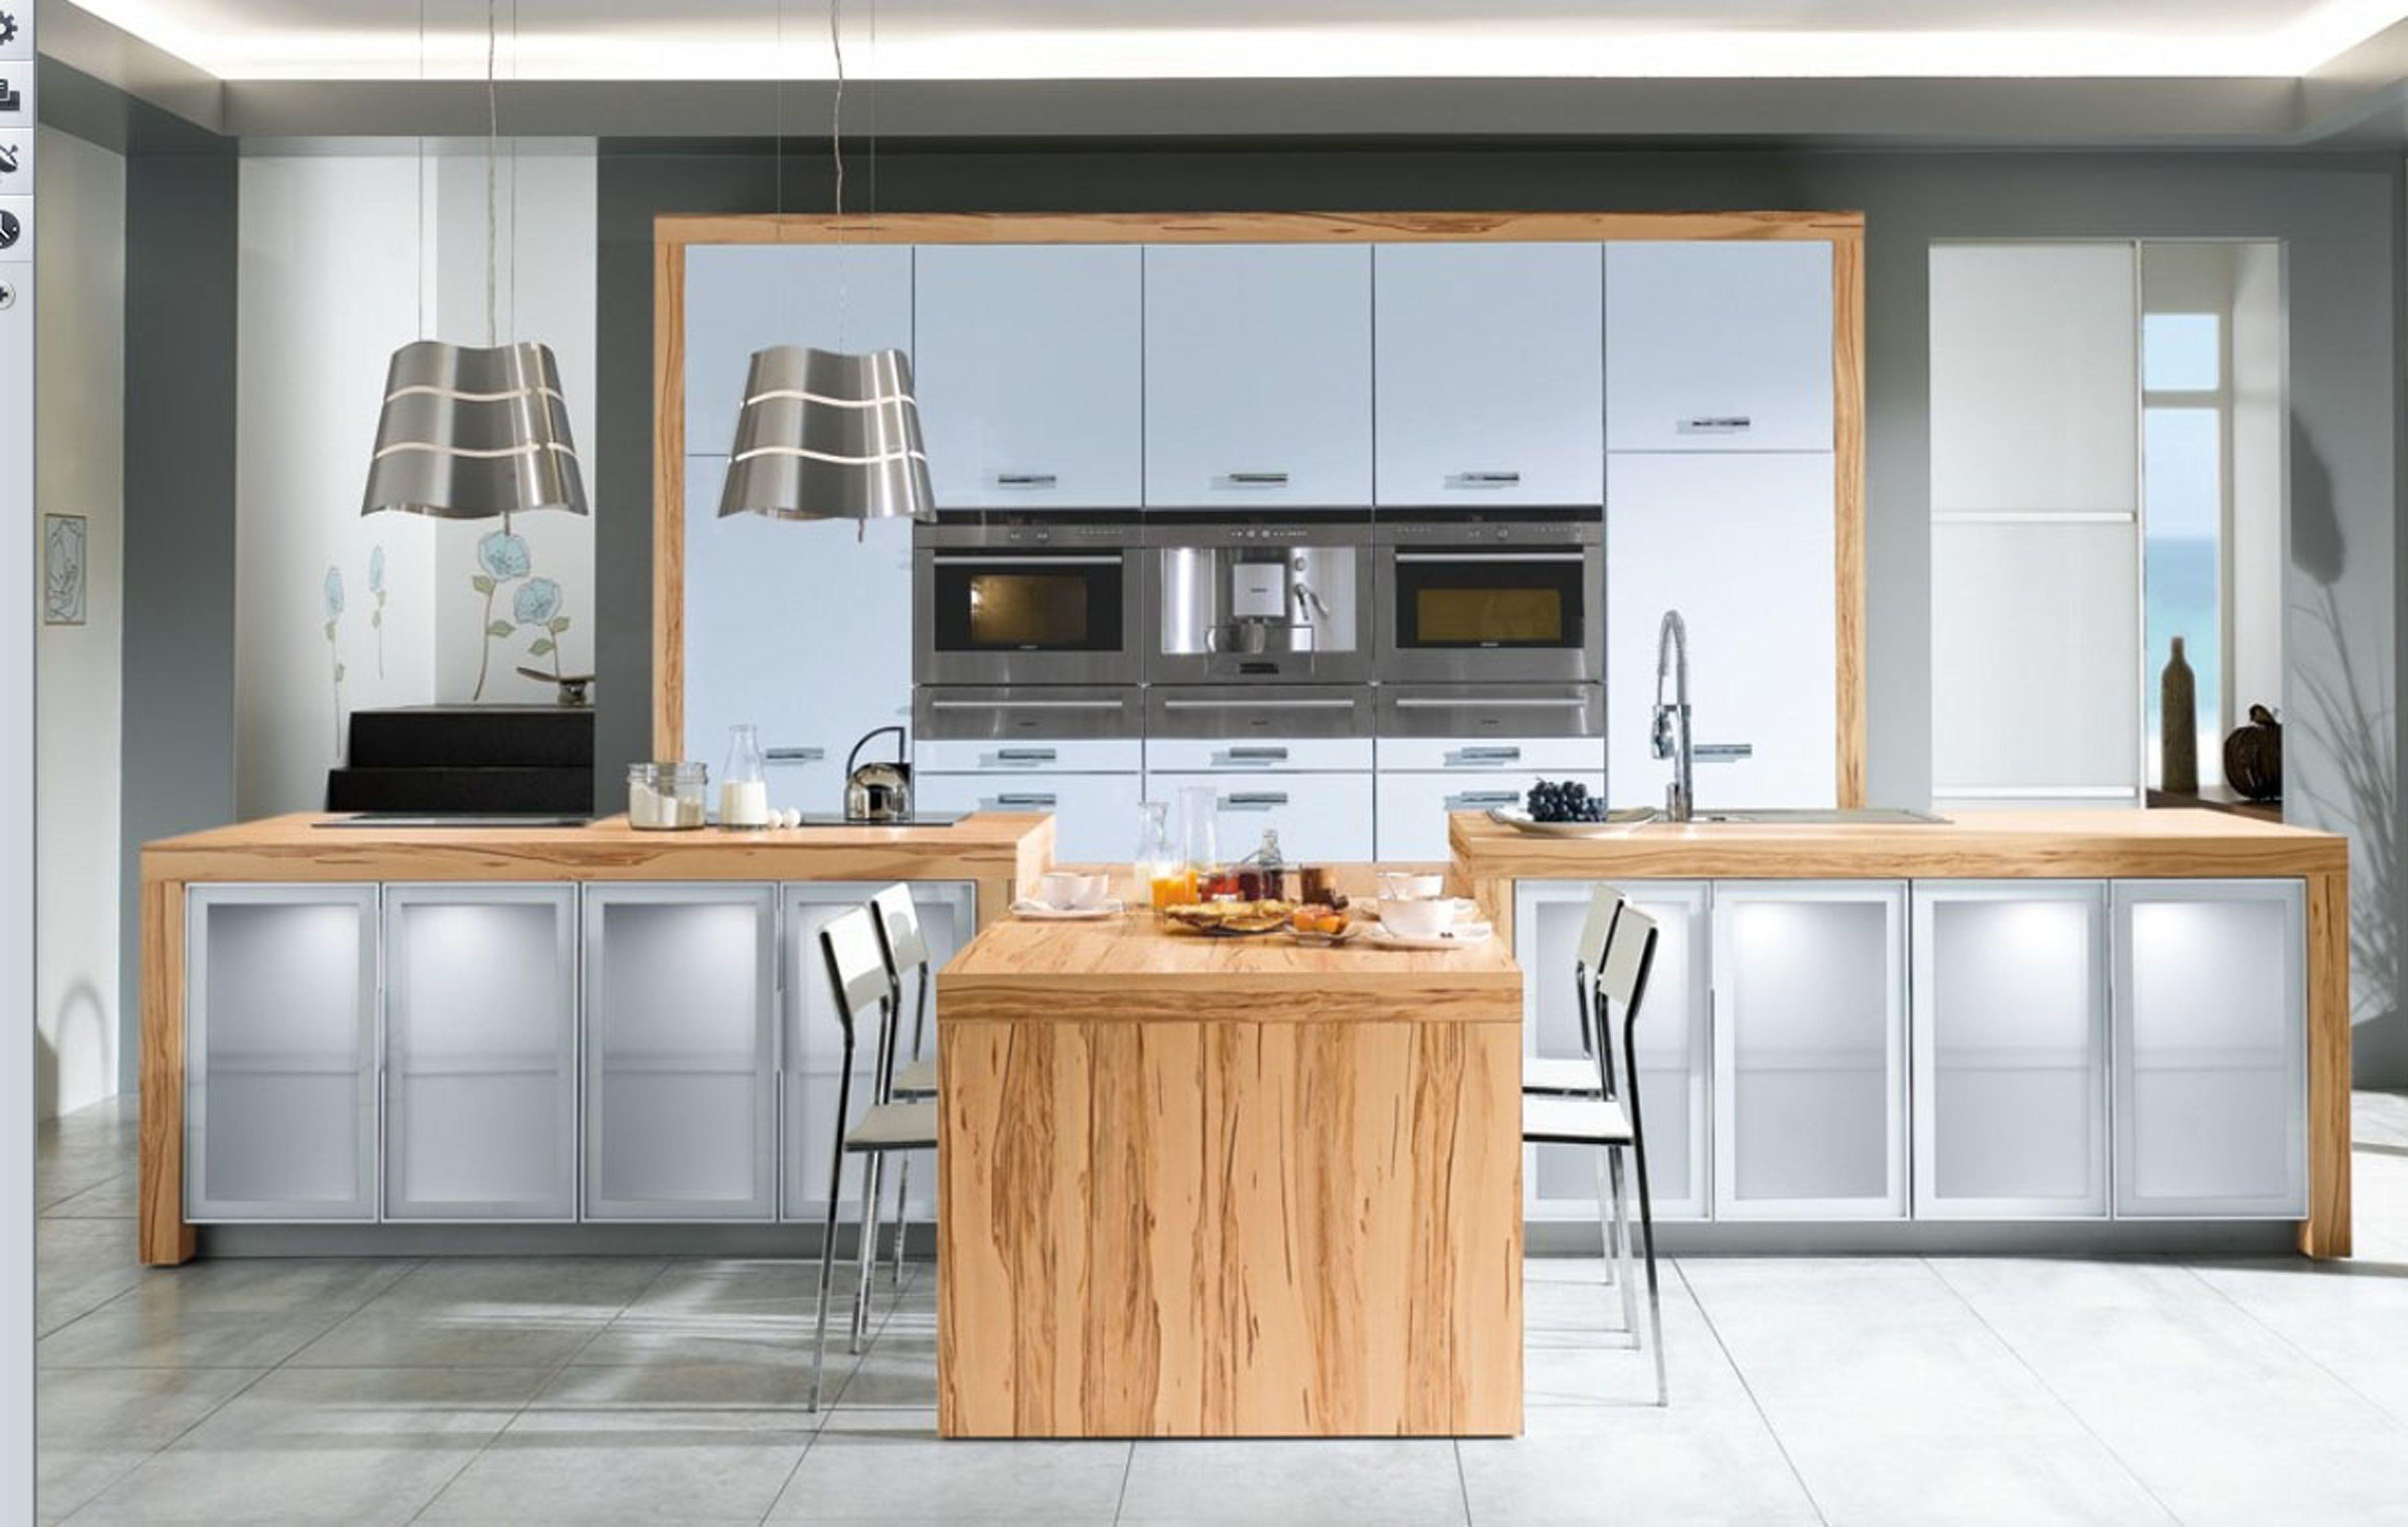 kitchen design ideas on a budget kitchen remodeling design ideas ...